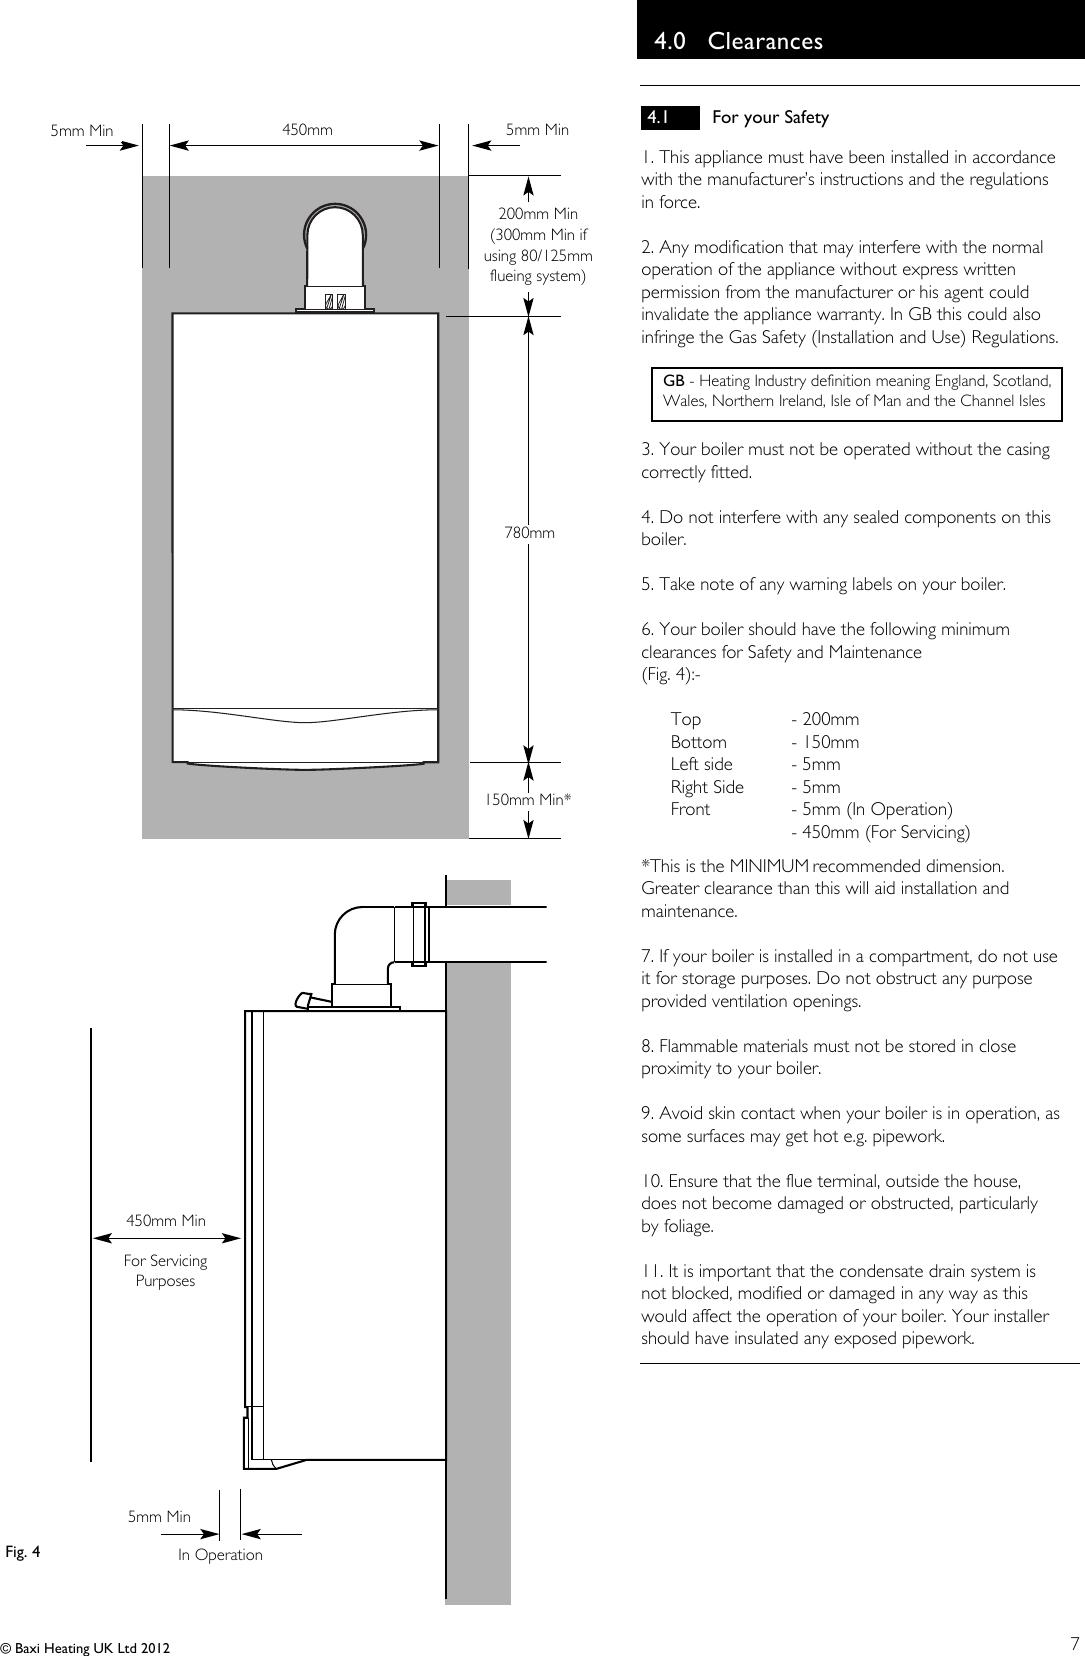 Vtg 3000 Le Boiler Wiring Diagram Schematic Diagrams Weil Mclain Contemporary Warranty Photos Electrical